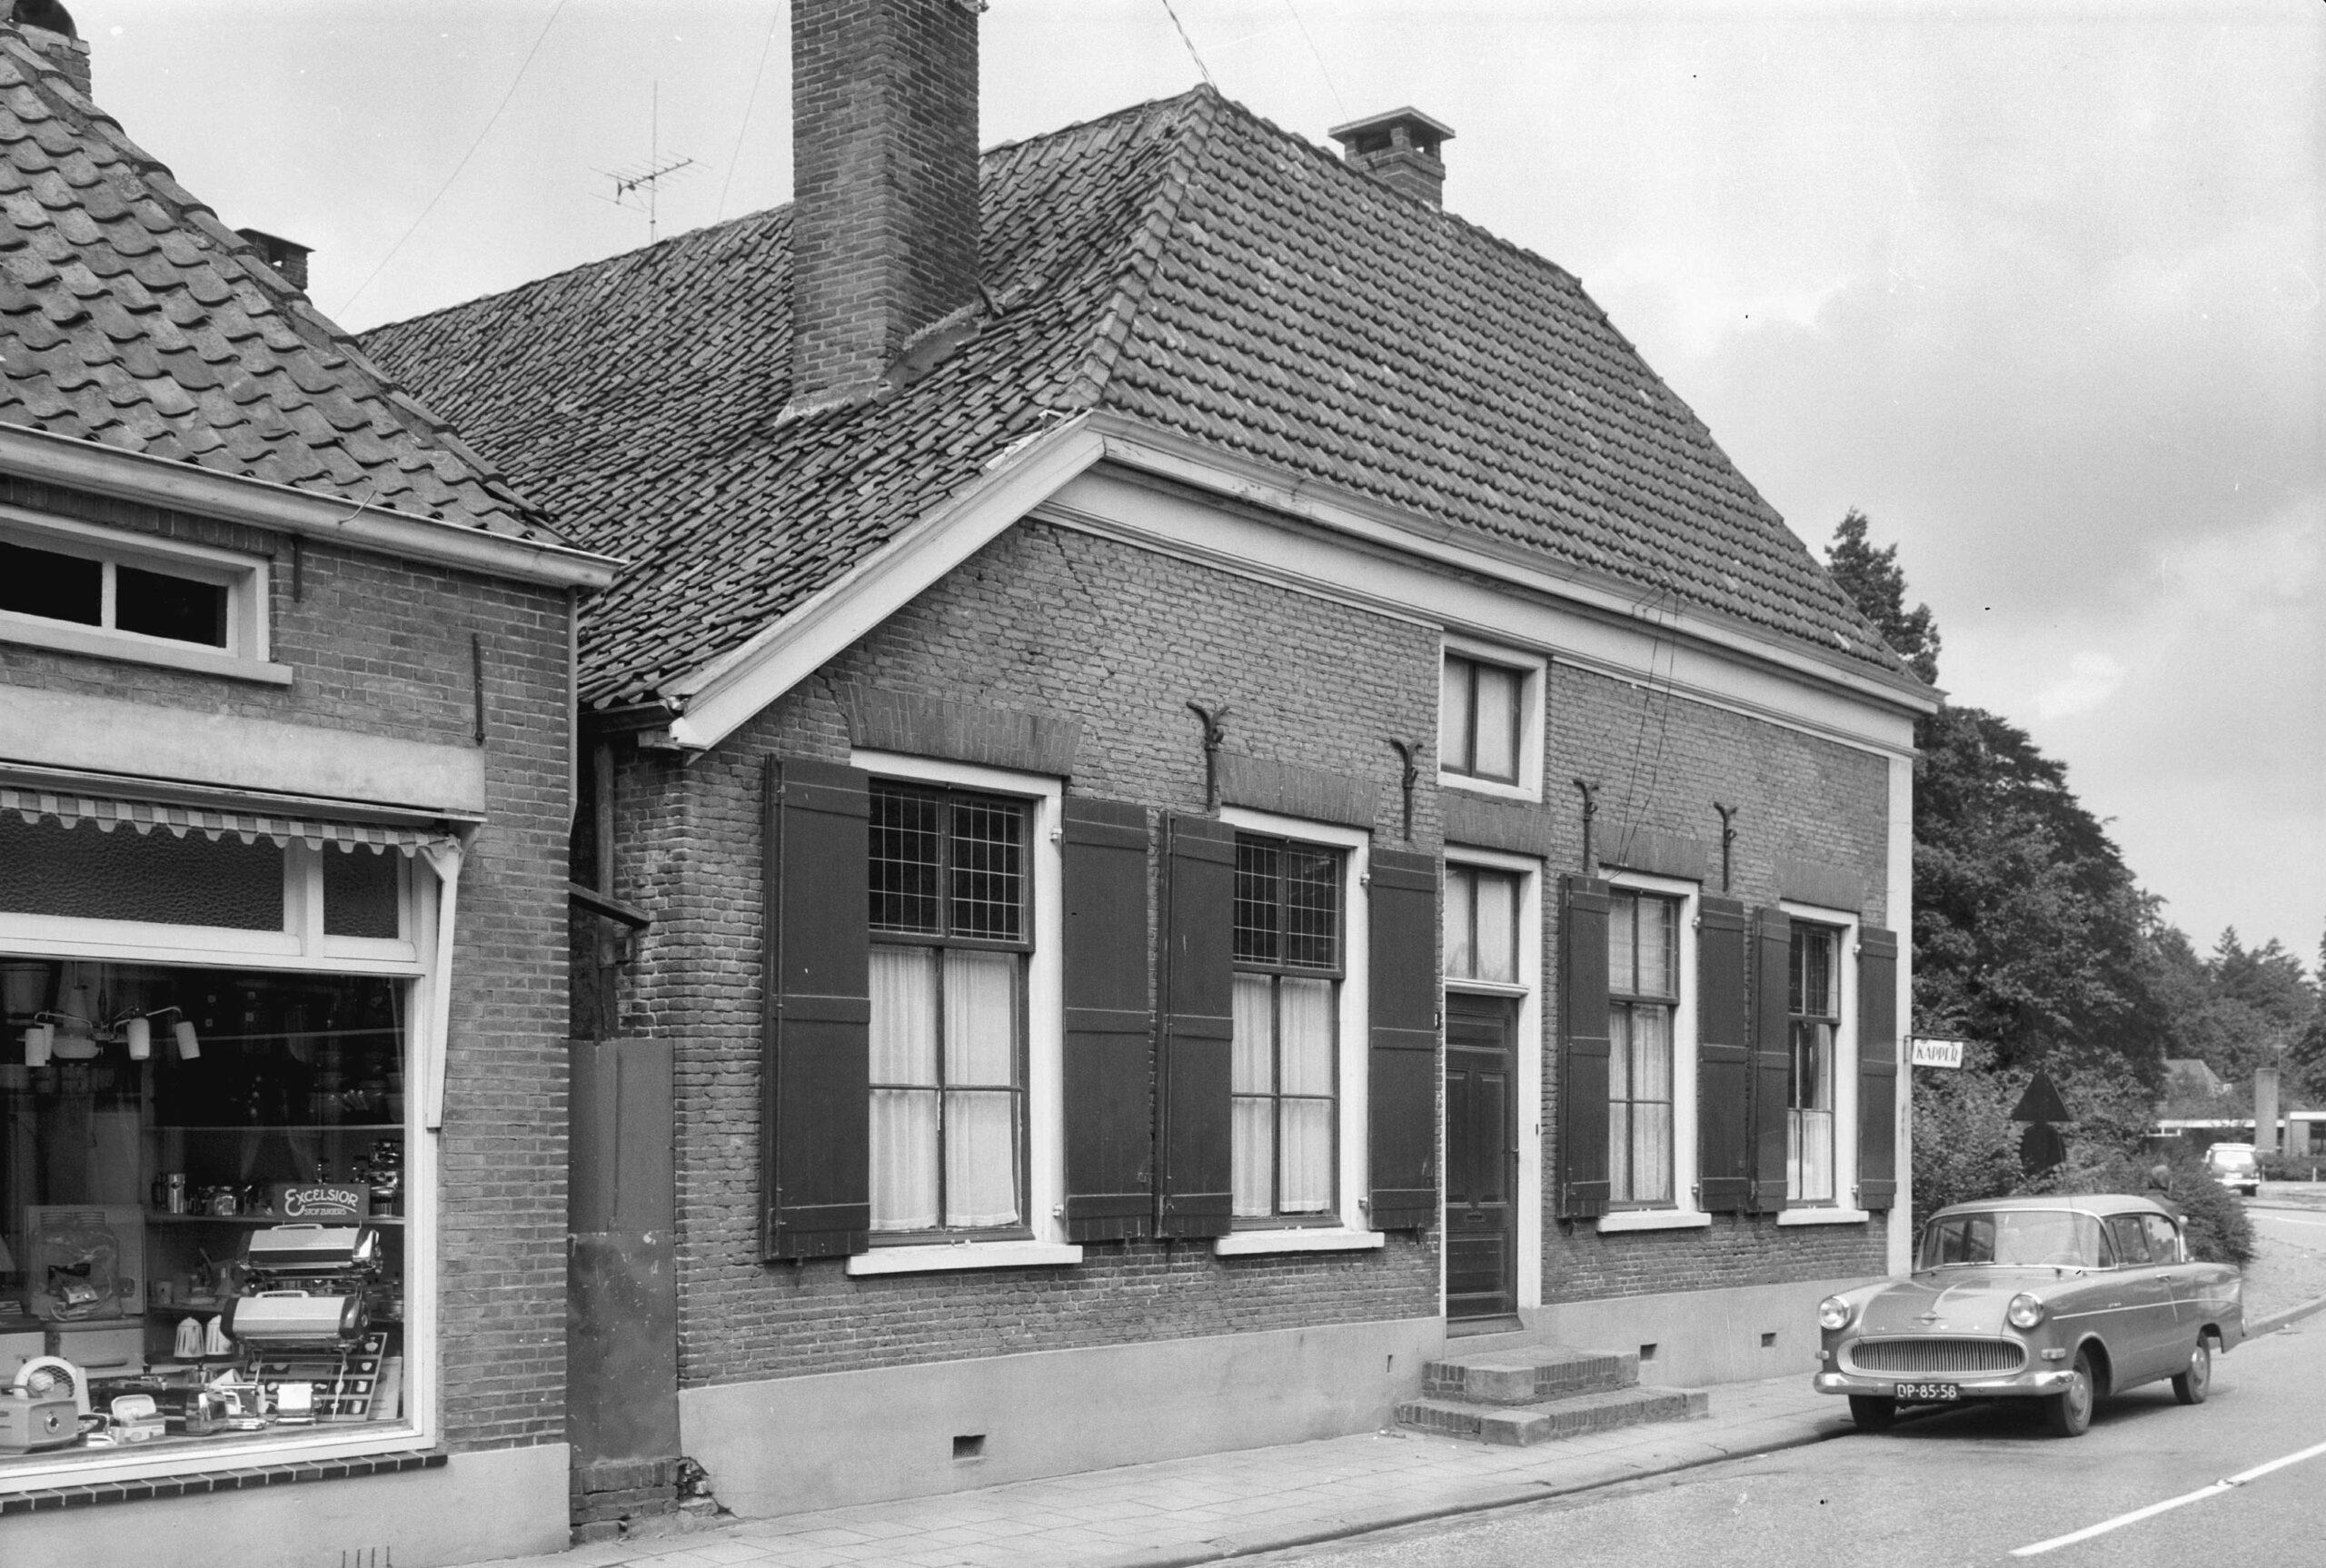 Laag-Keppel Dorpsstraat 2 en 4 Boerderij